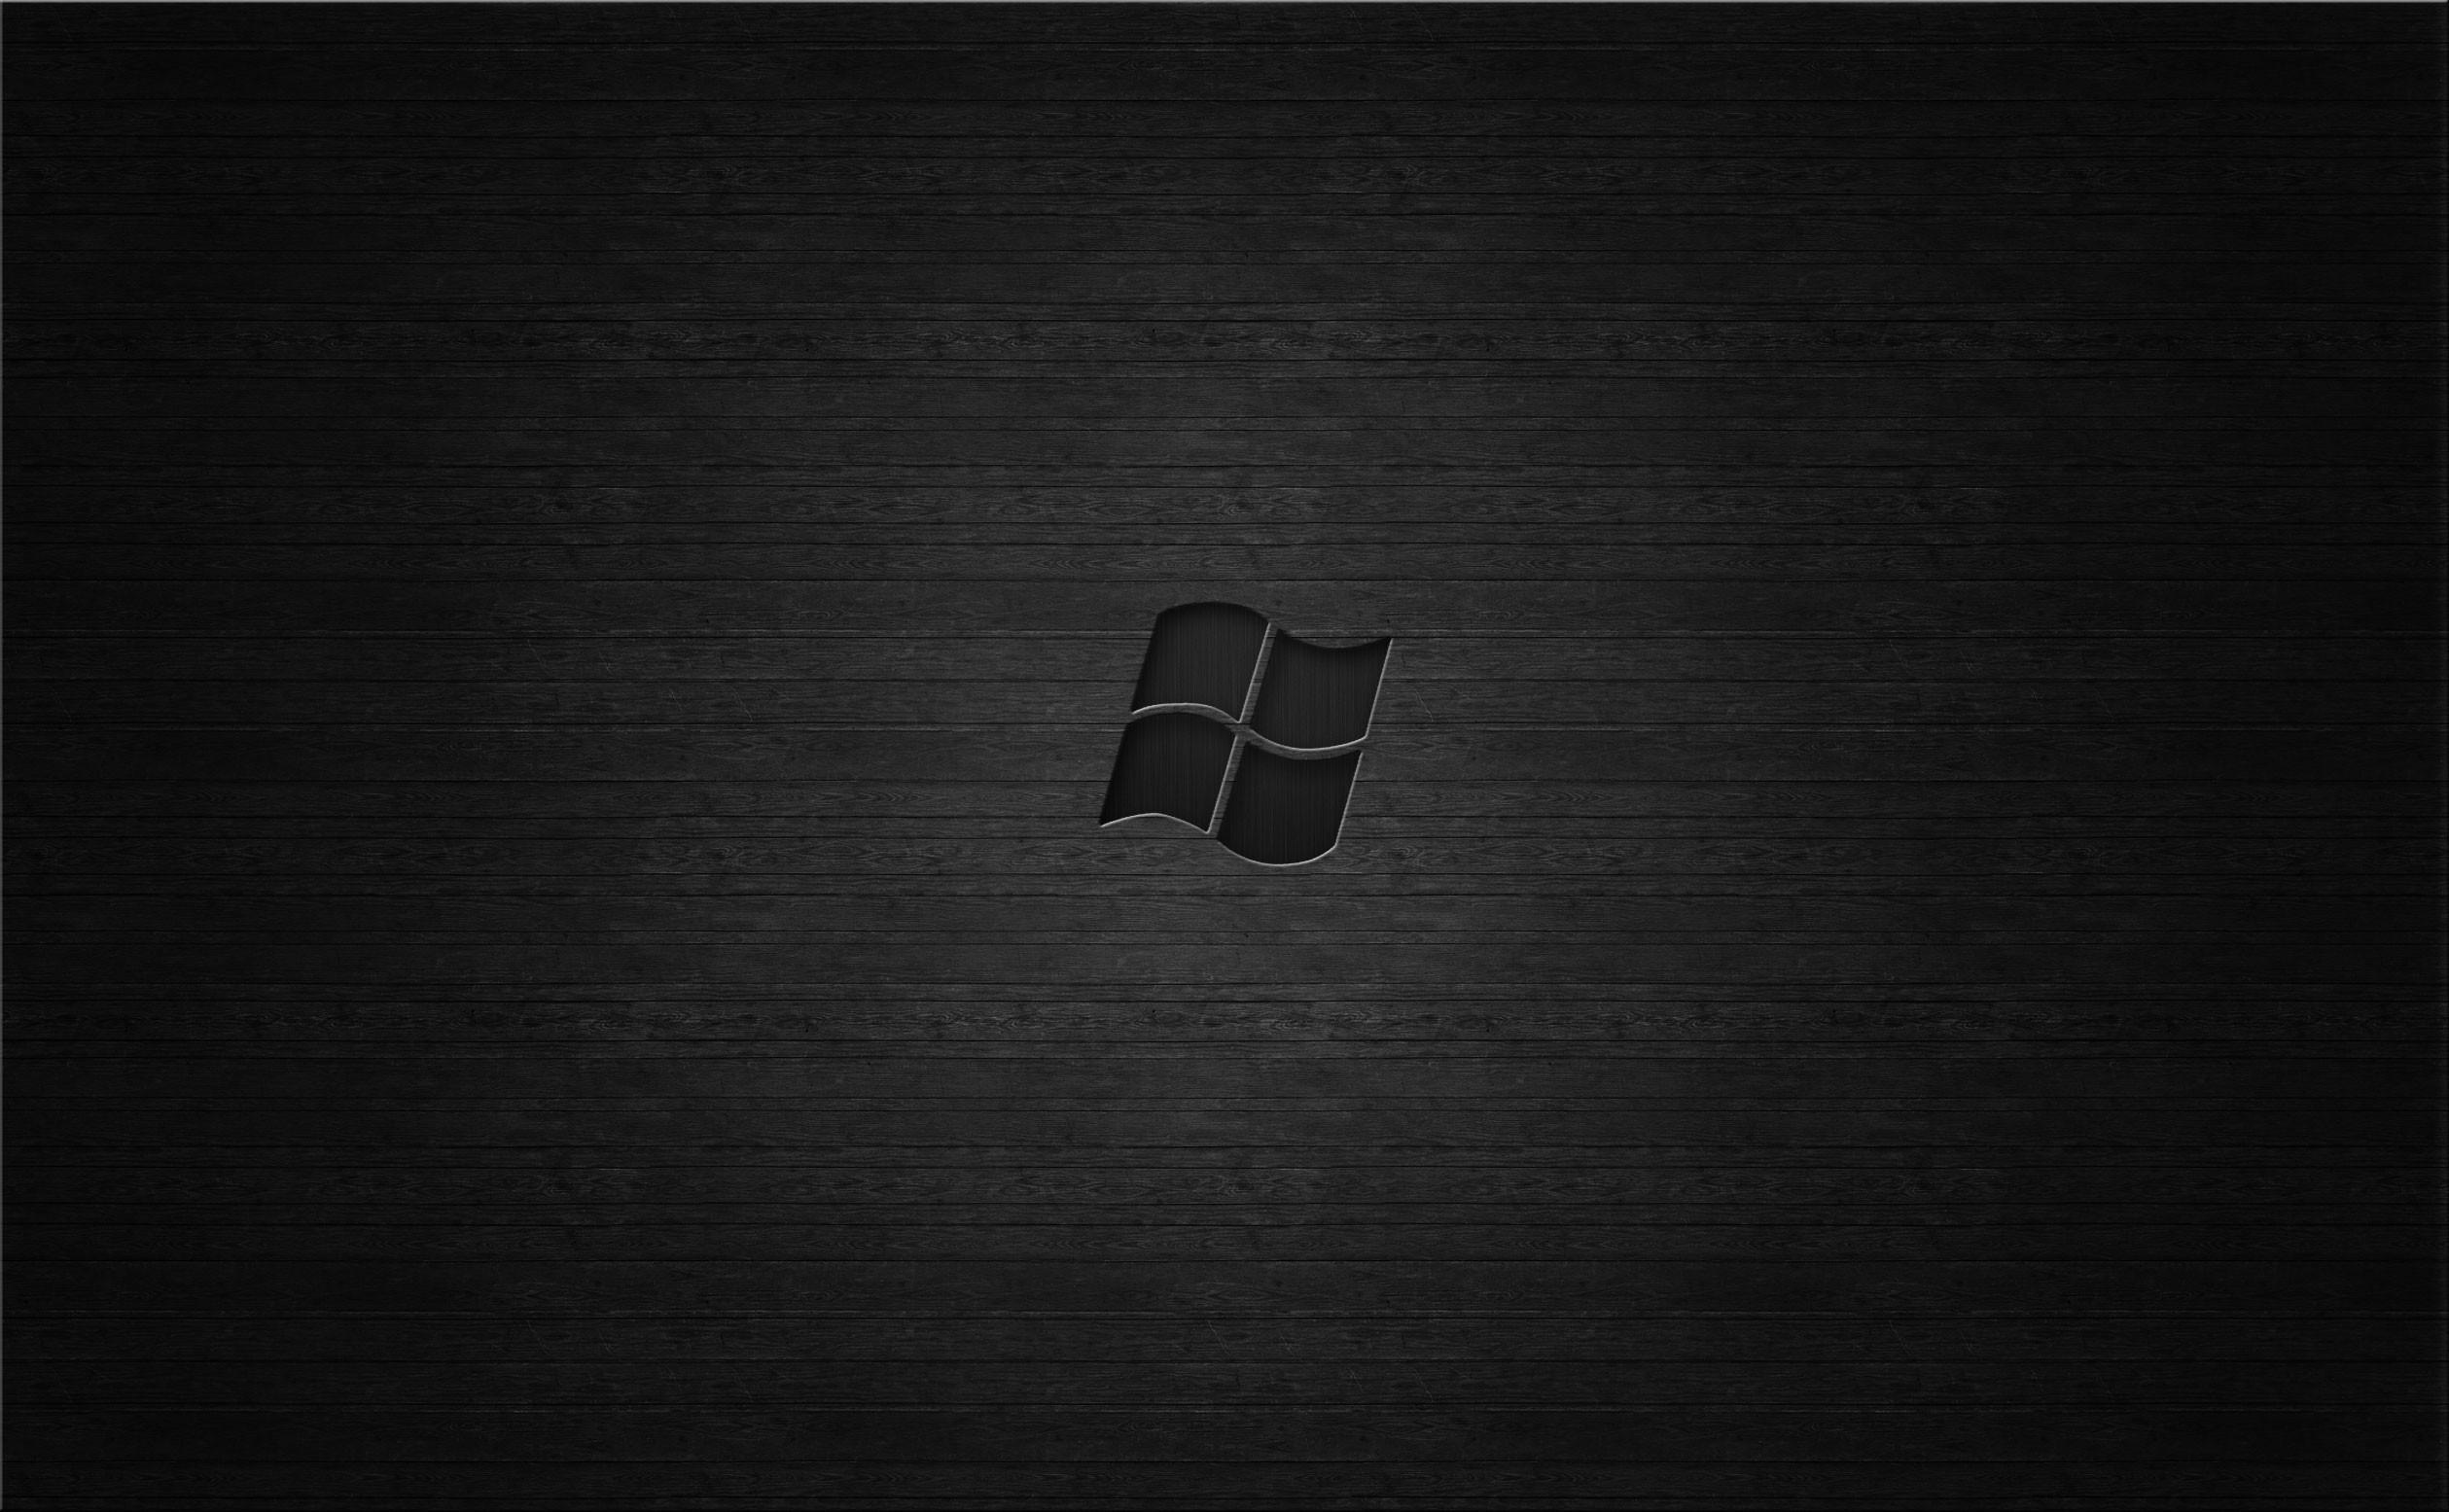 windows 7 dirty dark - photo #6